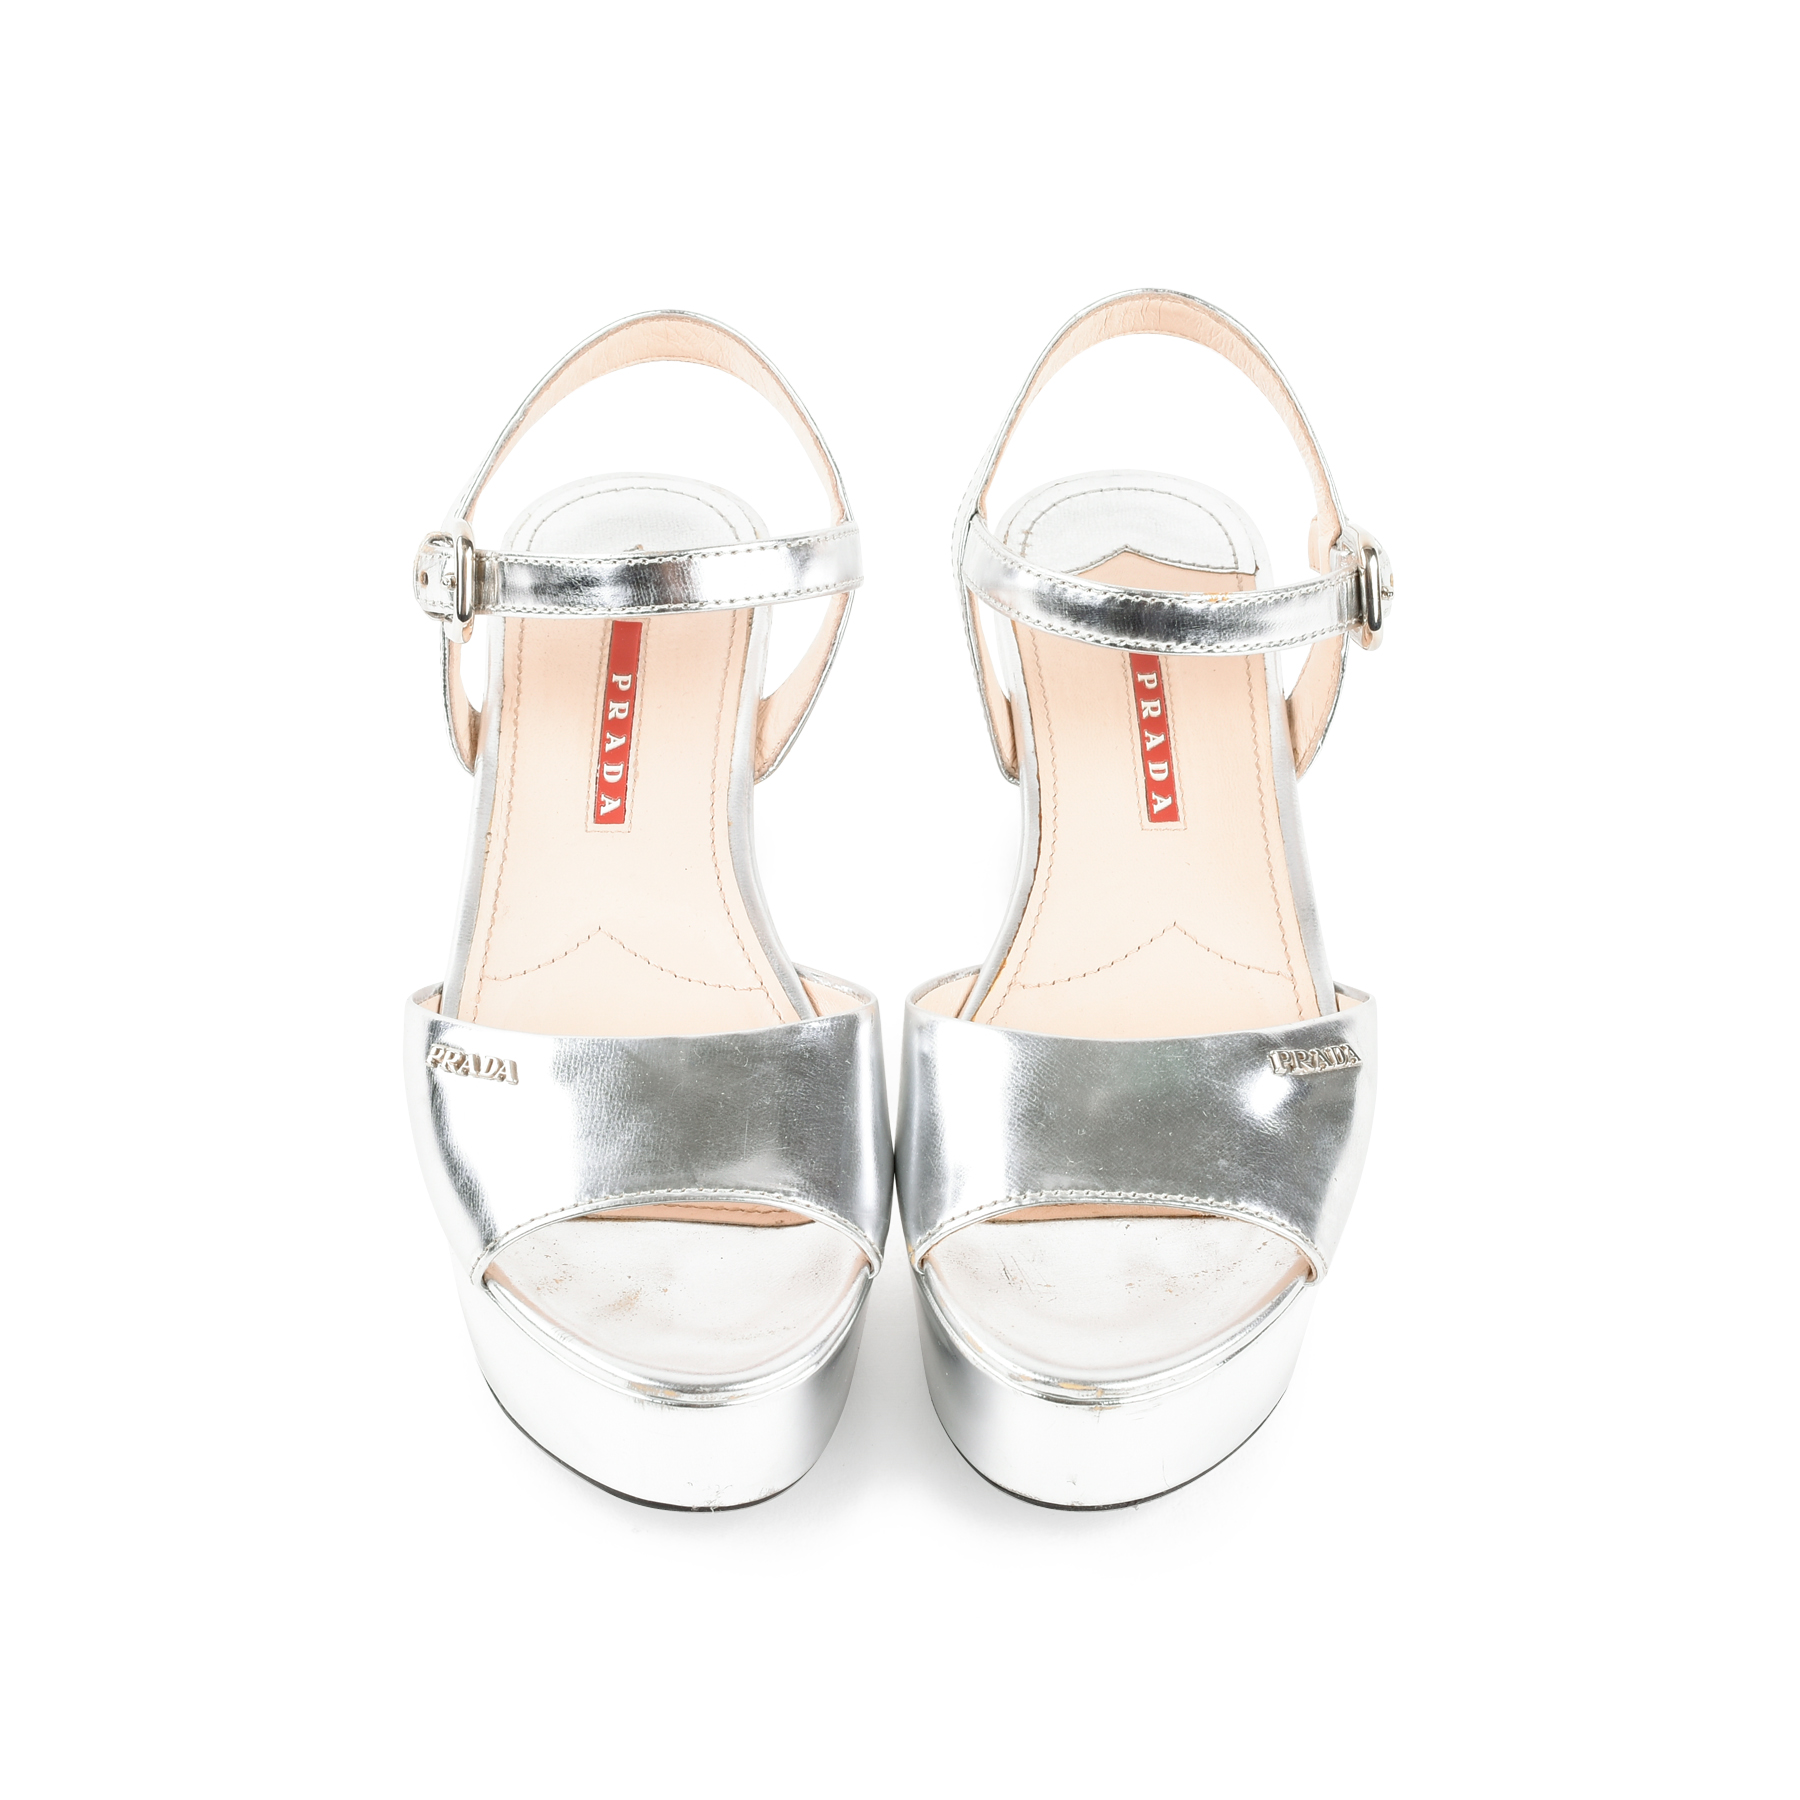 Platform Metallic Second Prada Sandalspss Authentic Hand Wedge 291 JlFK1c